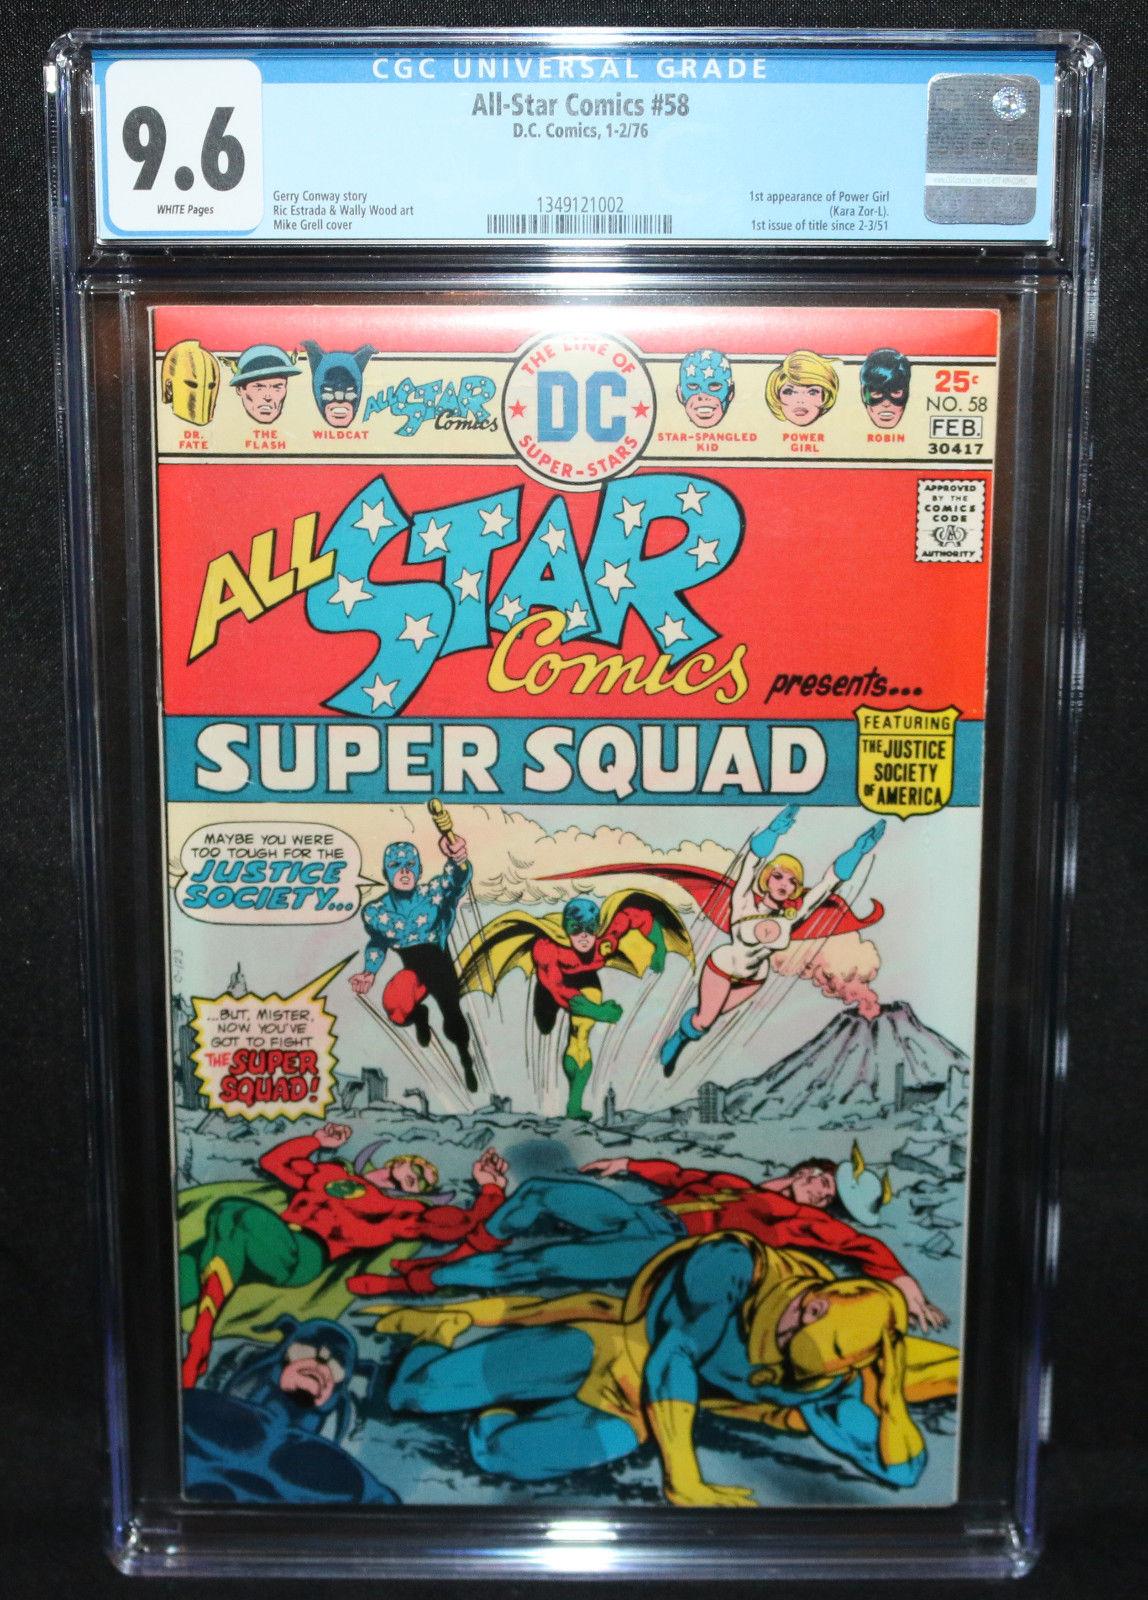 All-Star Comics #58 - 1st App of Power Girl - CGC Grade 9.6 - 1976